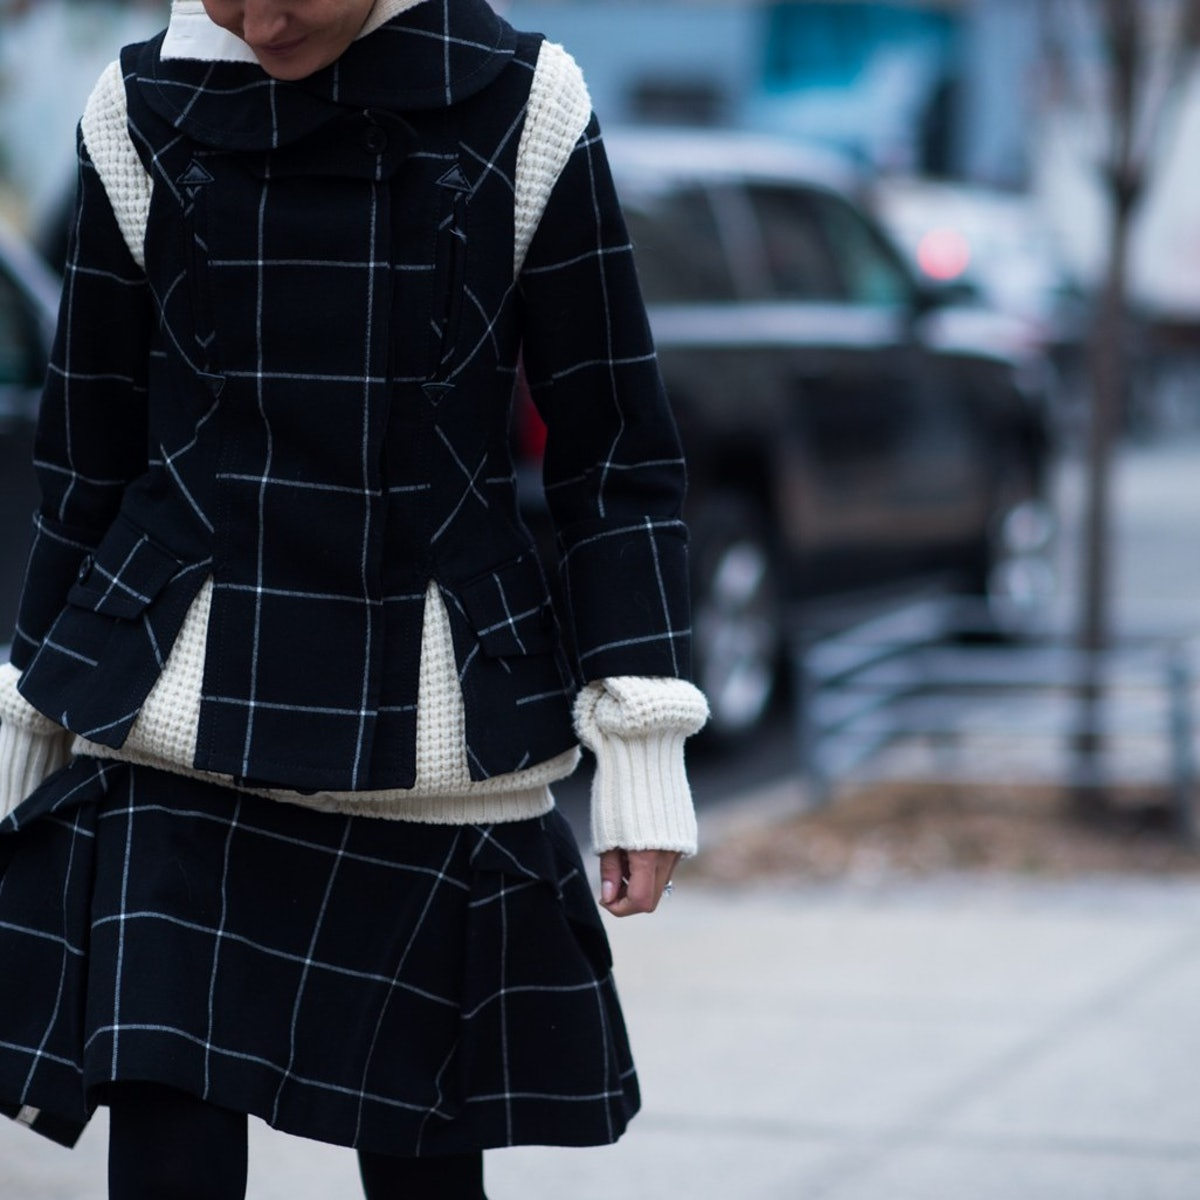 Le-21eme-Adam-Katz-Sinding-New-York-Fashion-Week-Fall-Winter-2016-2017-AKS8314.jpg